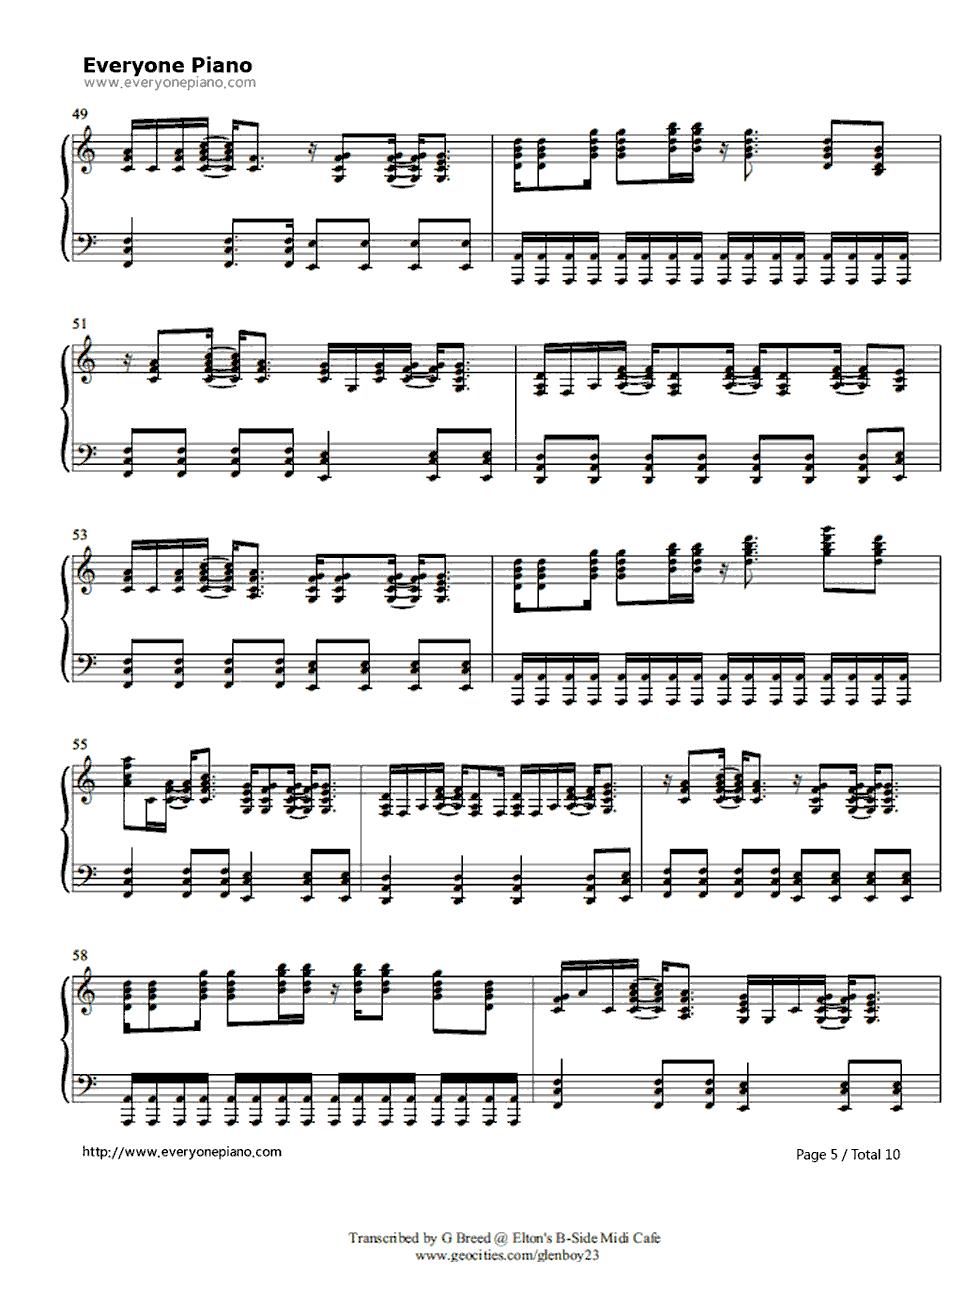 Tiny dancer elton john stave preview 5 free piano sheet music listen now print sheet tiny dancer elton john stave preview 5 hexwebz Gallery